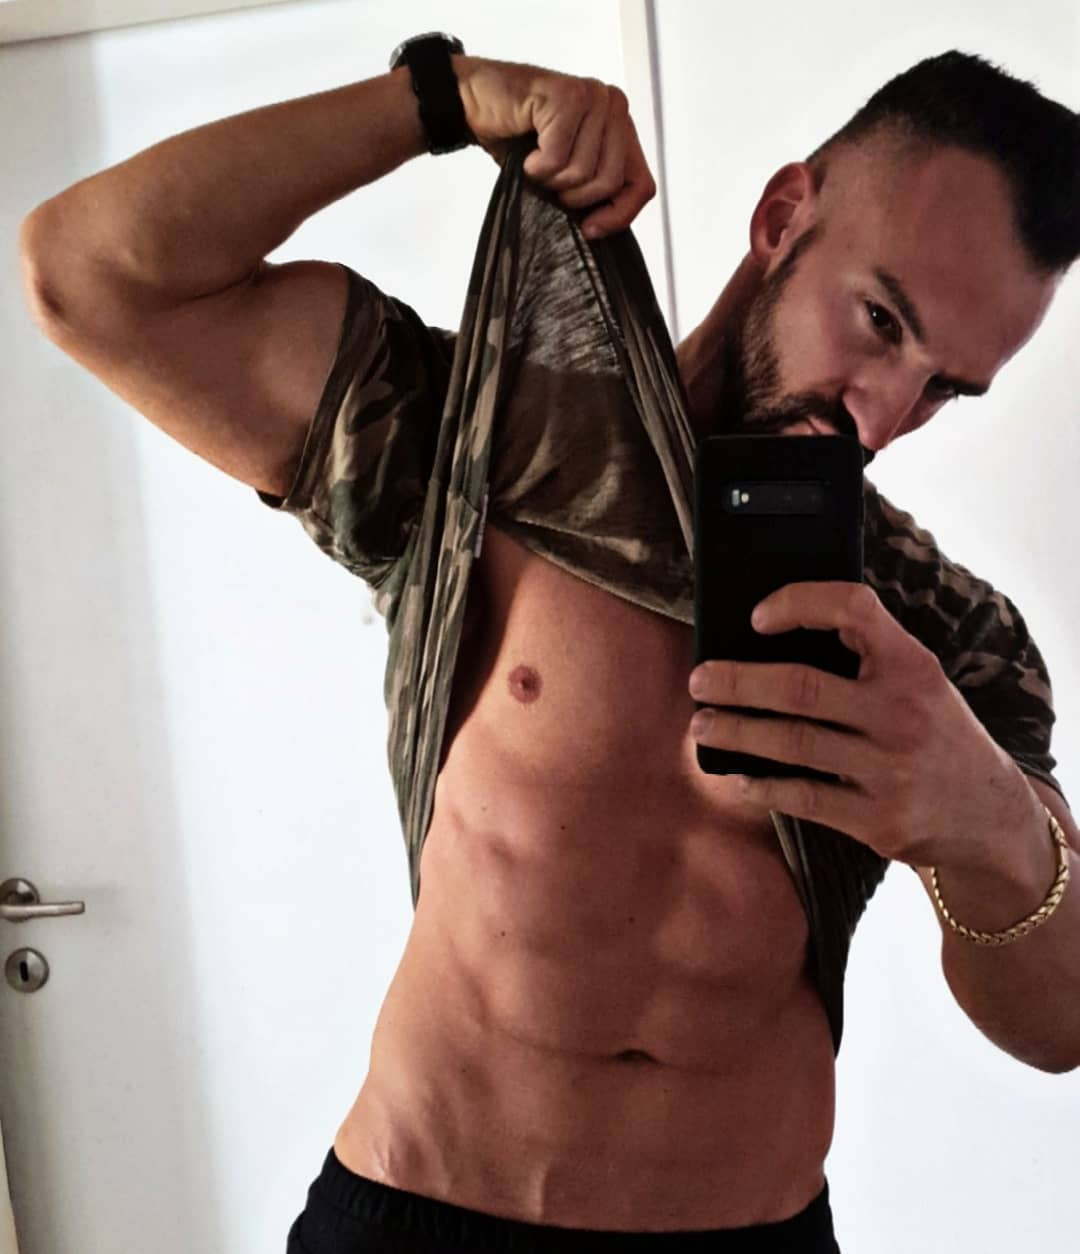 Kleiner Schnappschuss. Kein anaboles Licht, Diät etwas entspannter und kein Pump… ok außer in der Bosshose, da ist 24/7 Pump 😉😈 . #pump #pumped #boss #muscles #abs #sixpack #shredded #diet #getfit #fitnessmotivation #fitfam #fitfamgermany #fitlife #fitnessmotivation #fitnessaddicted #getstrong #mcfit #mcfitberlin #johnreed #fitness #transformationtuesday #goals #rambo #berlin #spandau